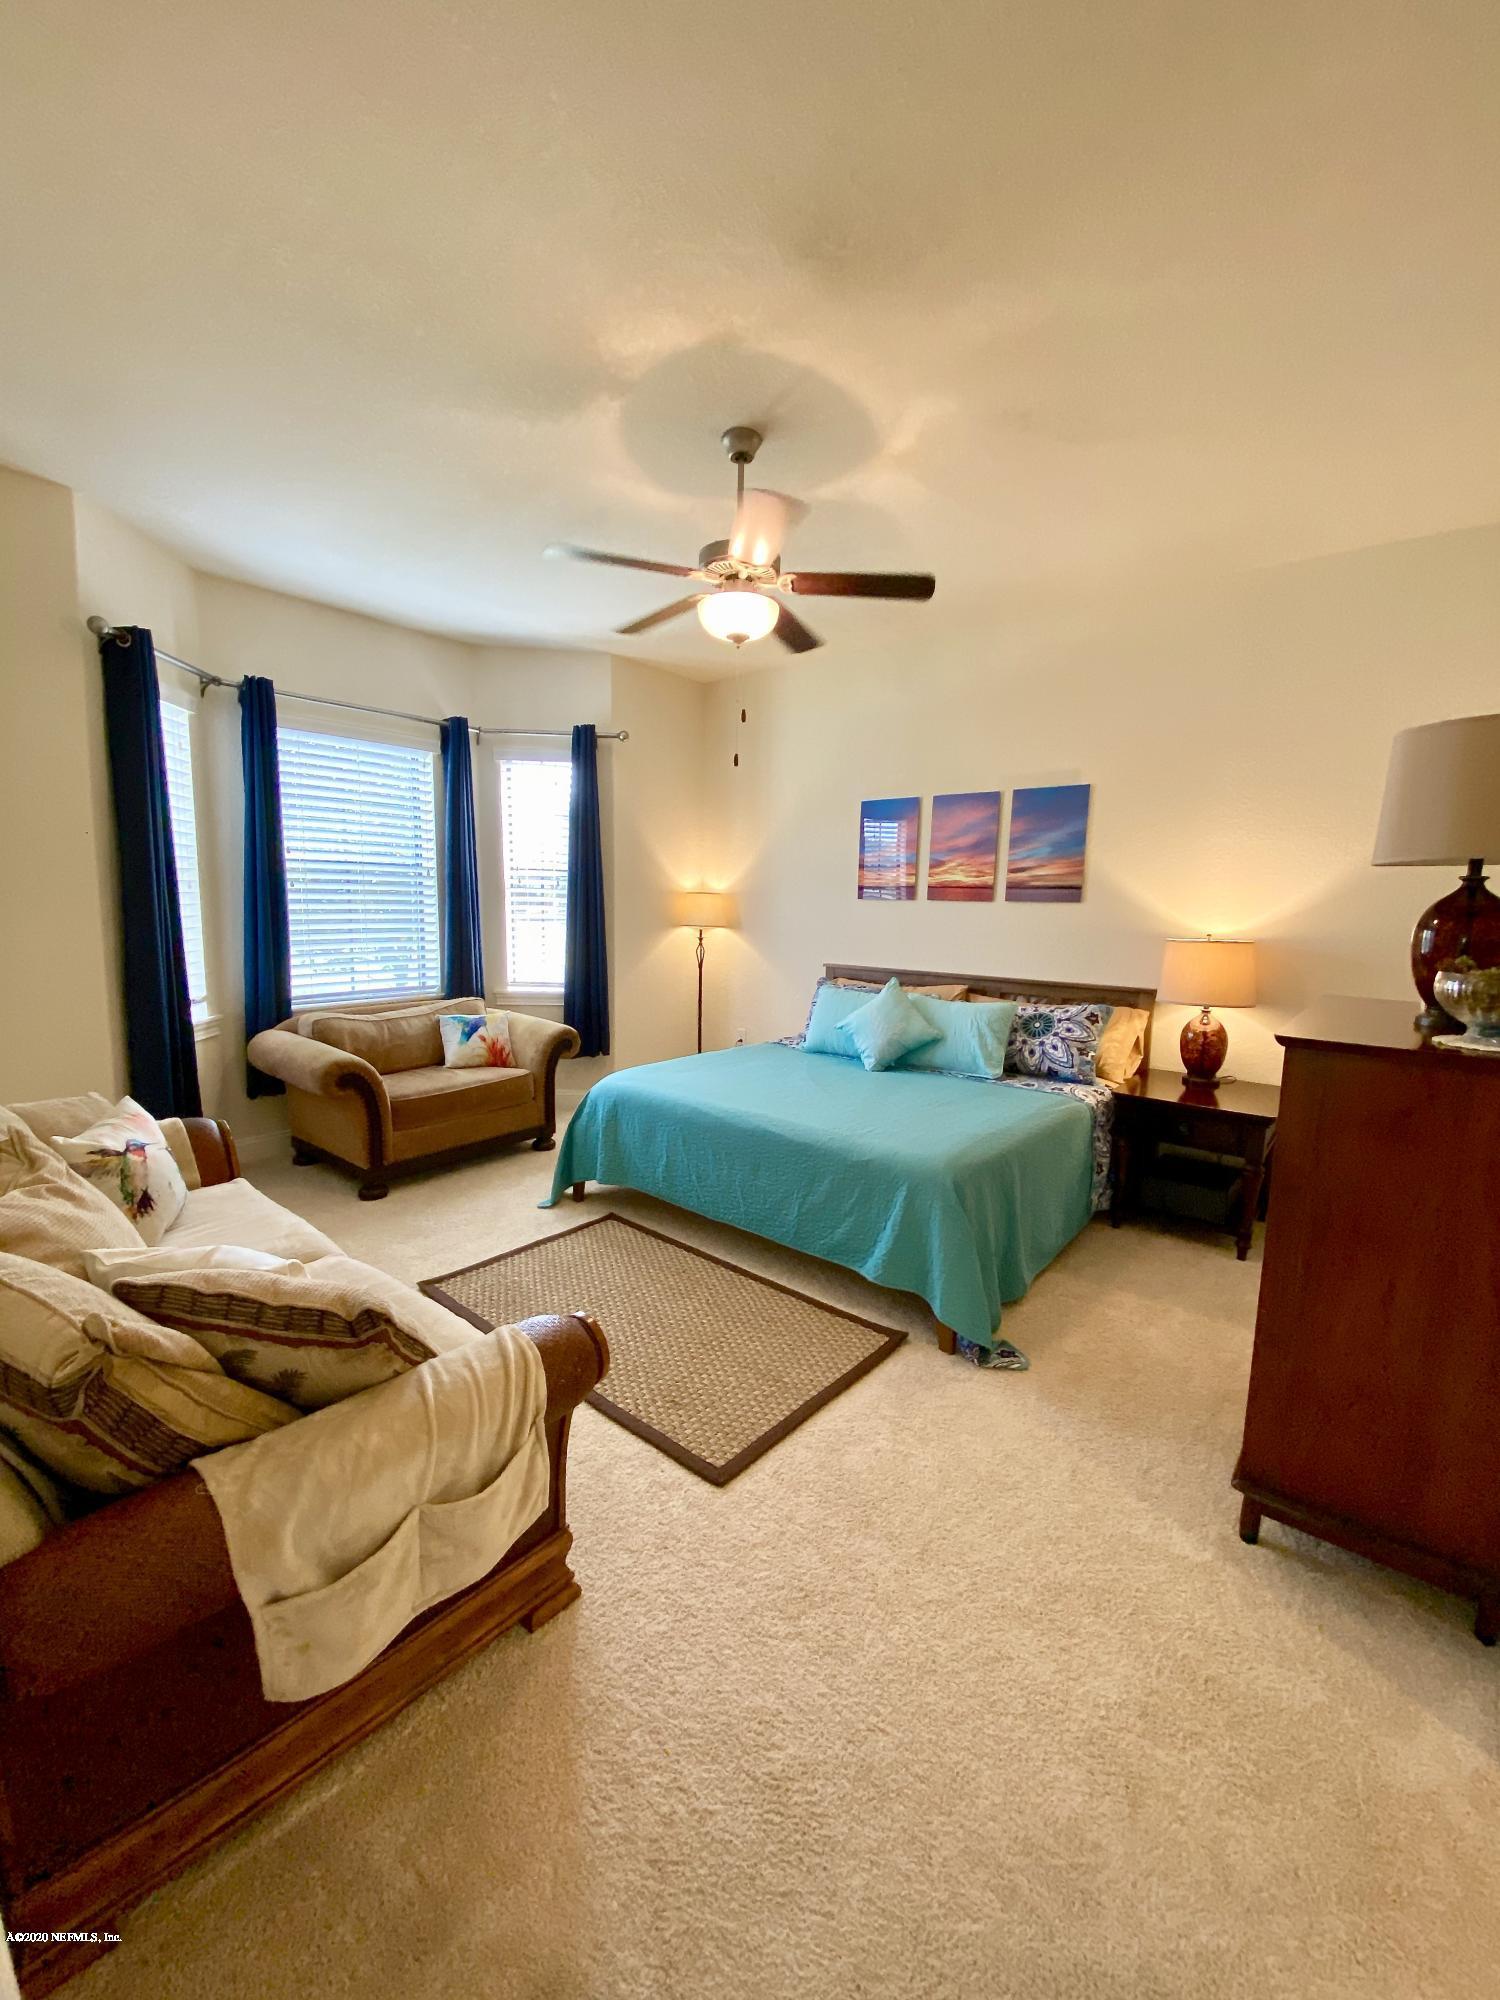 198 LATERRA LINKS, ST AUGUSTINE, FLORIDA 32092, 2 Bedrooms Bedrooms, ,2 BathroomsBathrooms,Residential,For sale,LATERRA LINKS,1043340